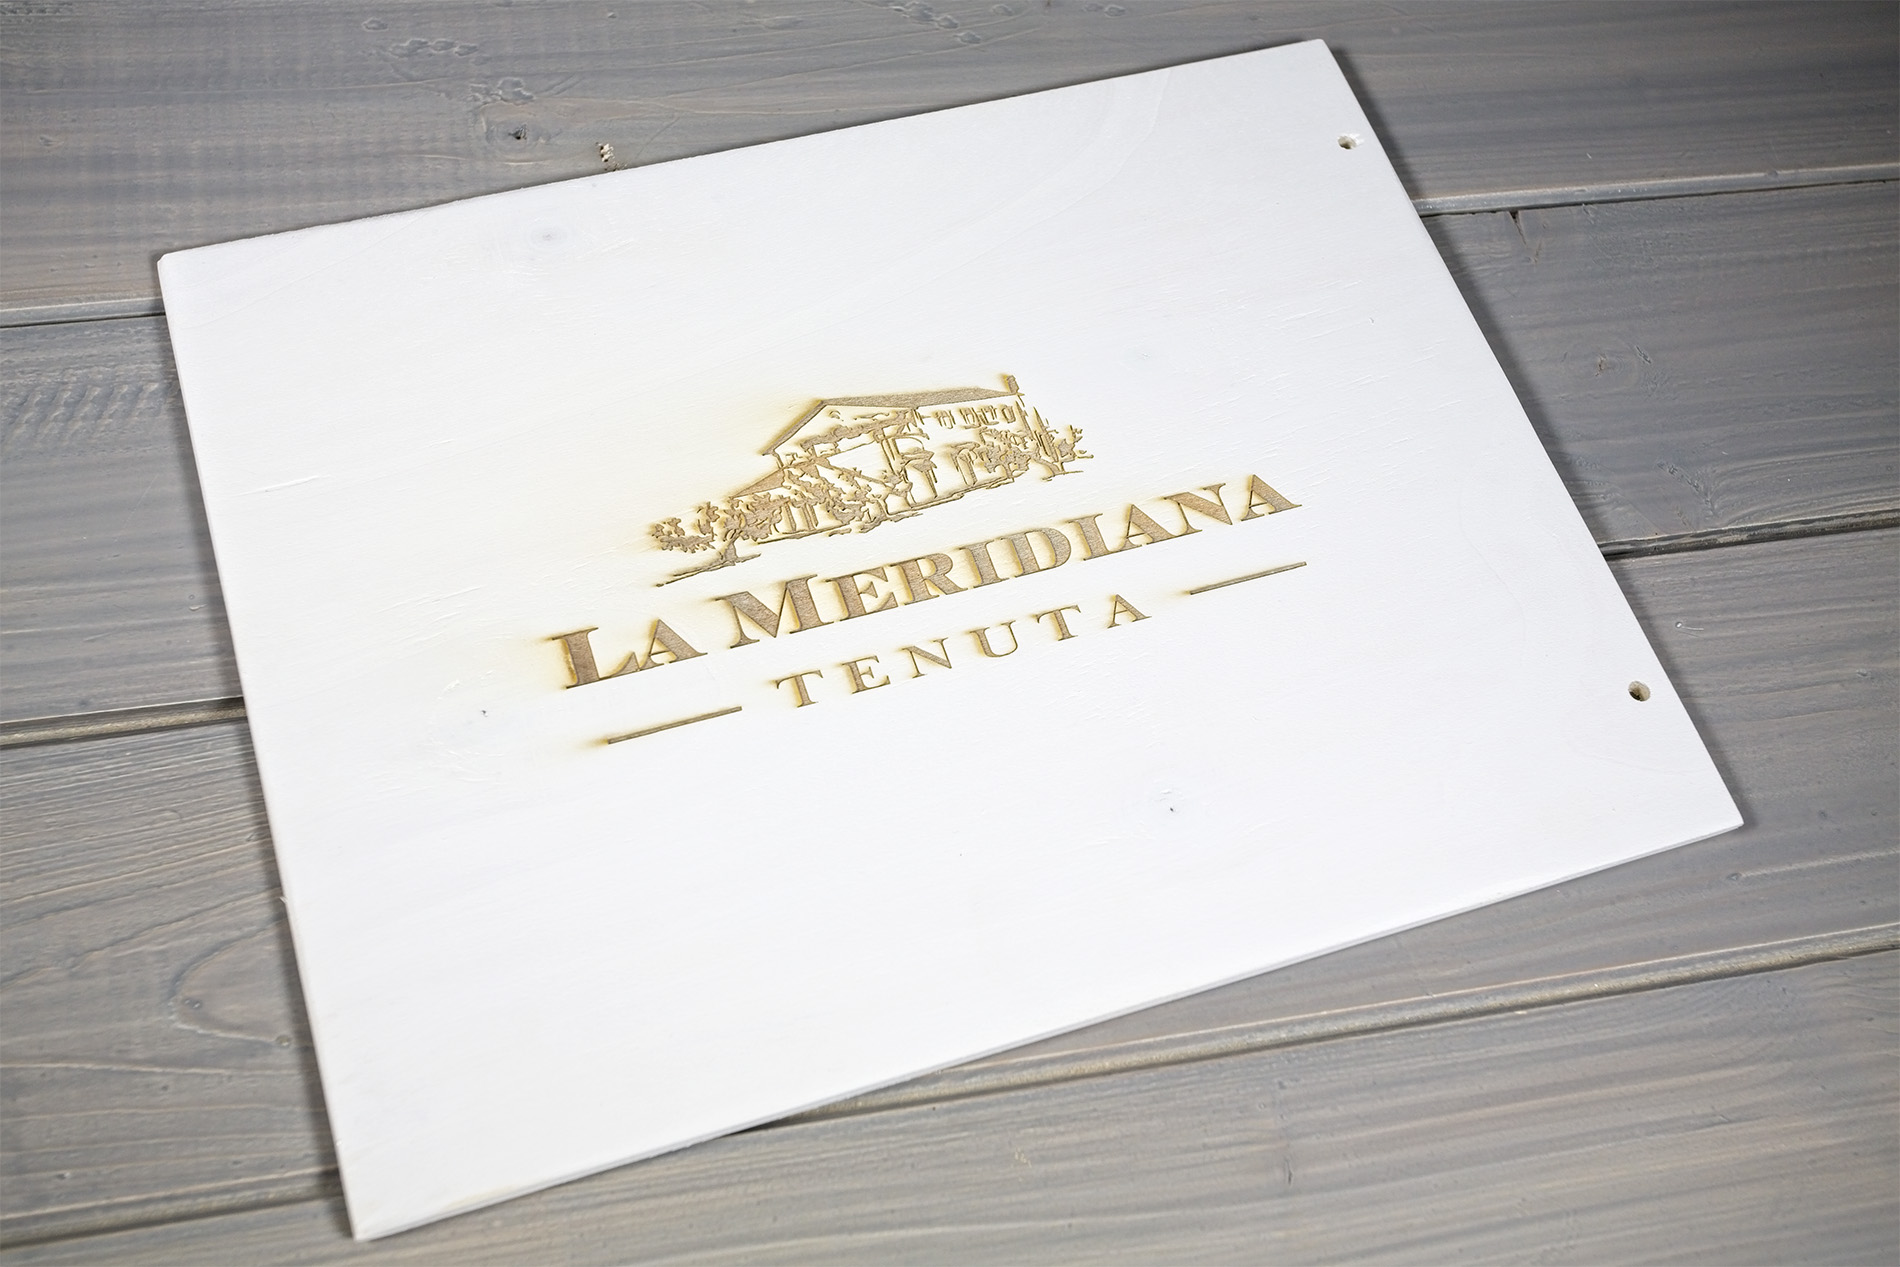 Portamenu Addaura Tentuta La Meridiana